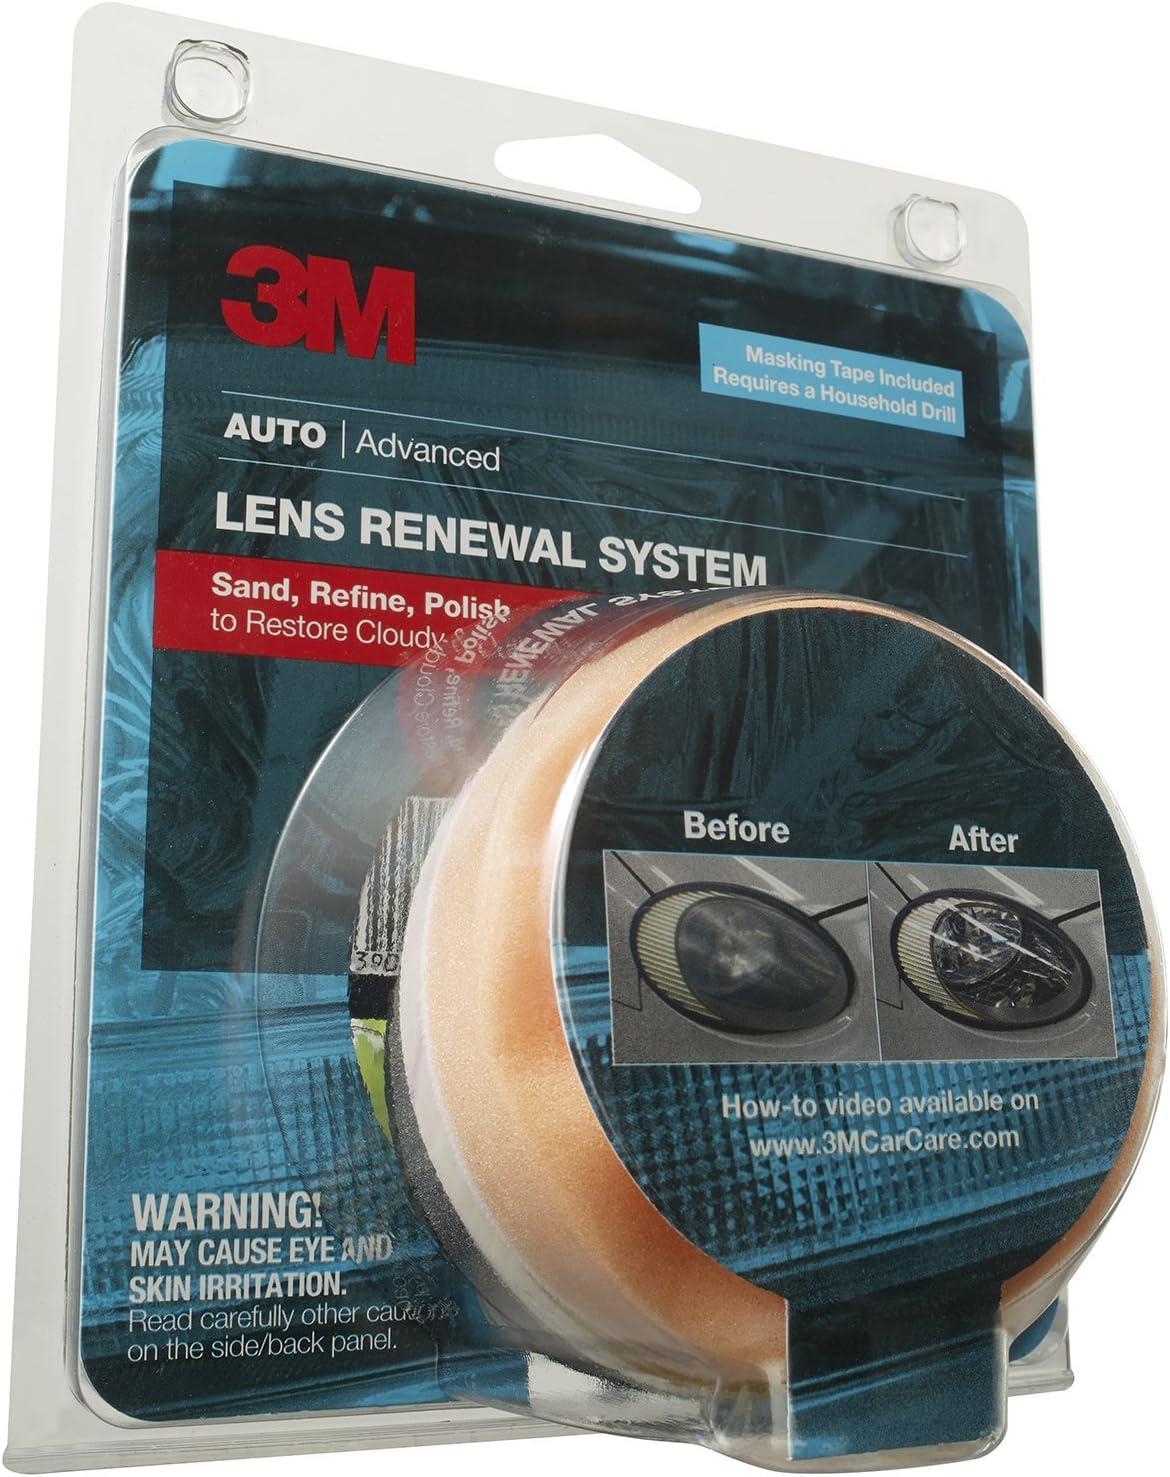 3M Lens Renewal System, 39014